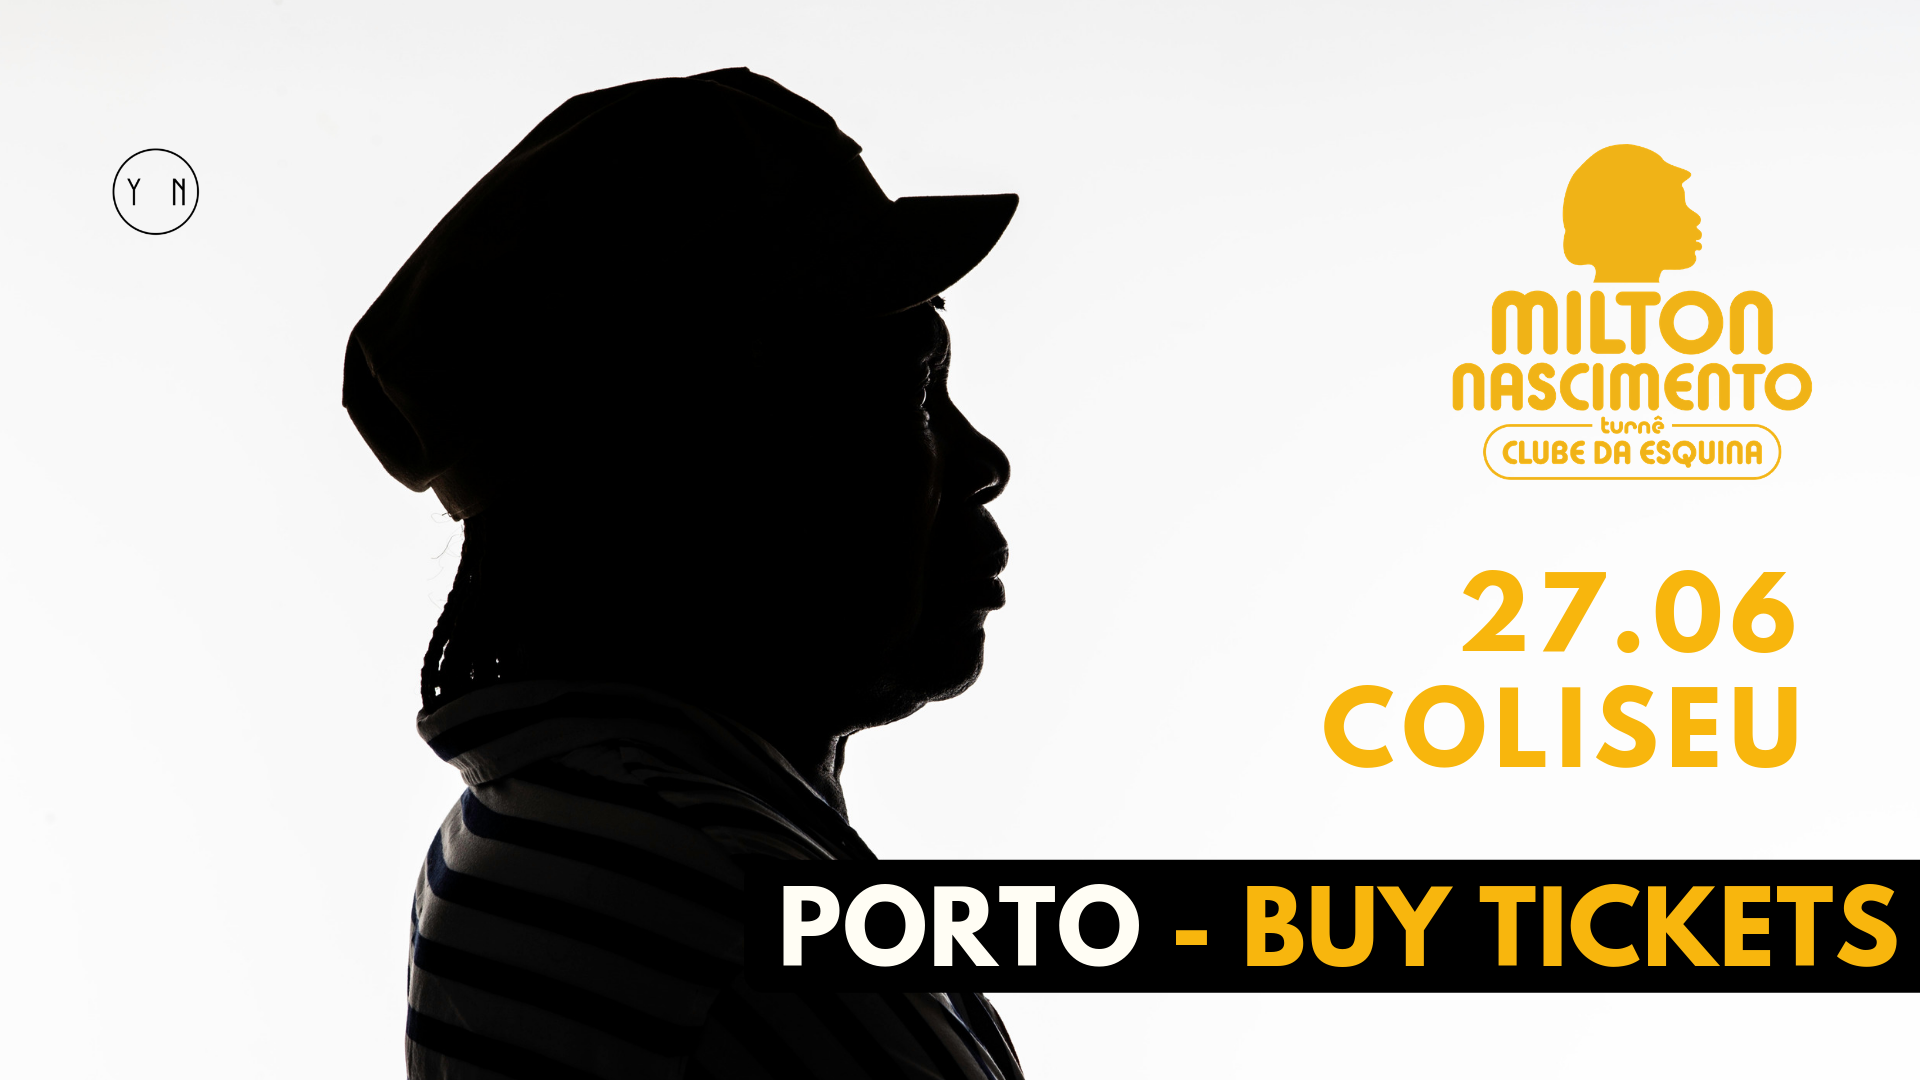 MiltonNascimento_Porto_2019_Bilhetes_Coliseu.png